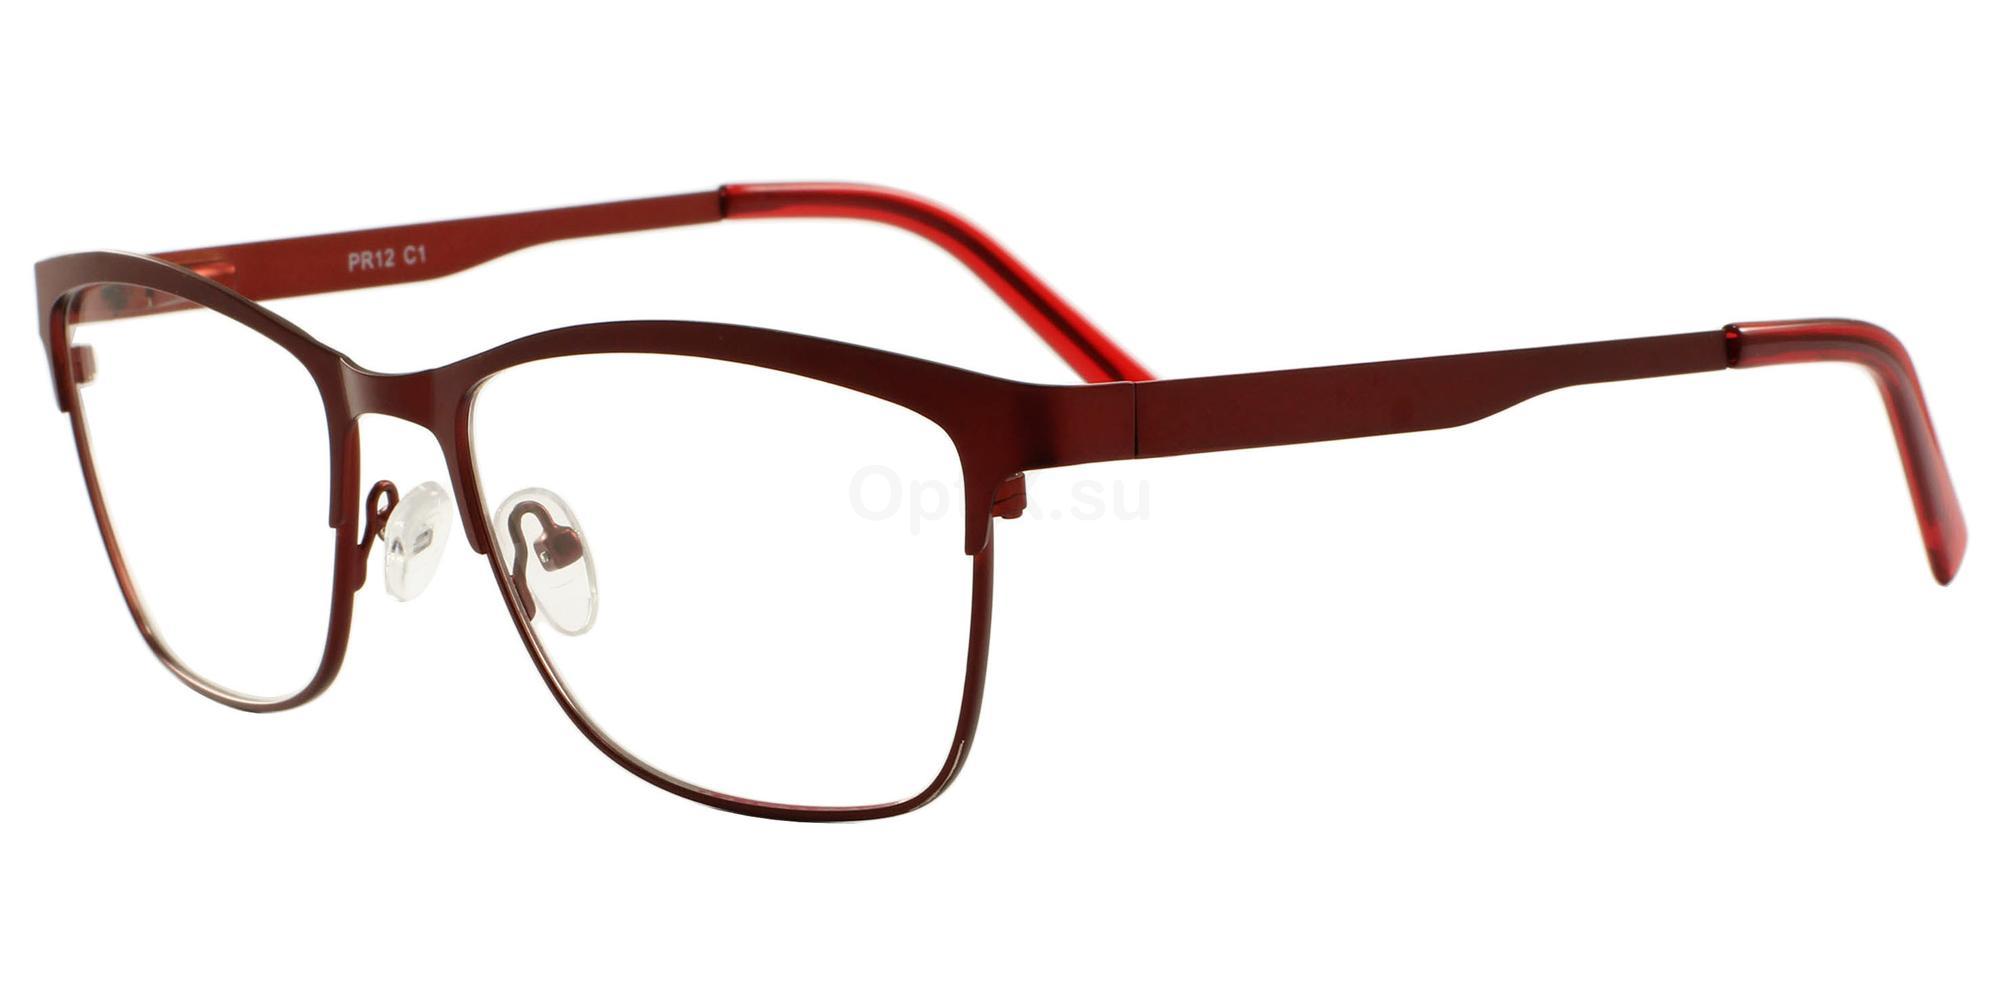 C1 12 Glasses, Pink Ribbon